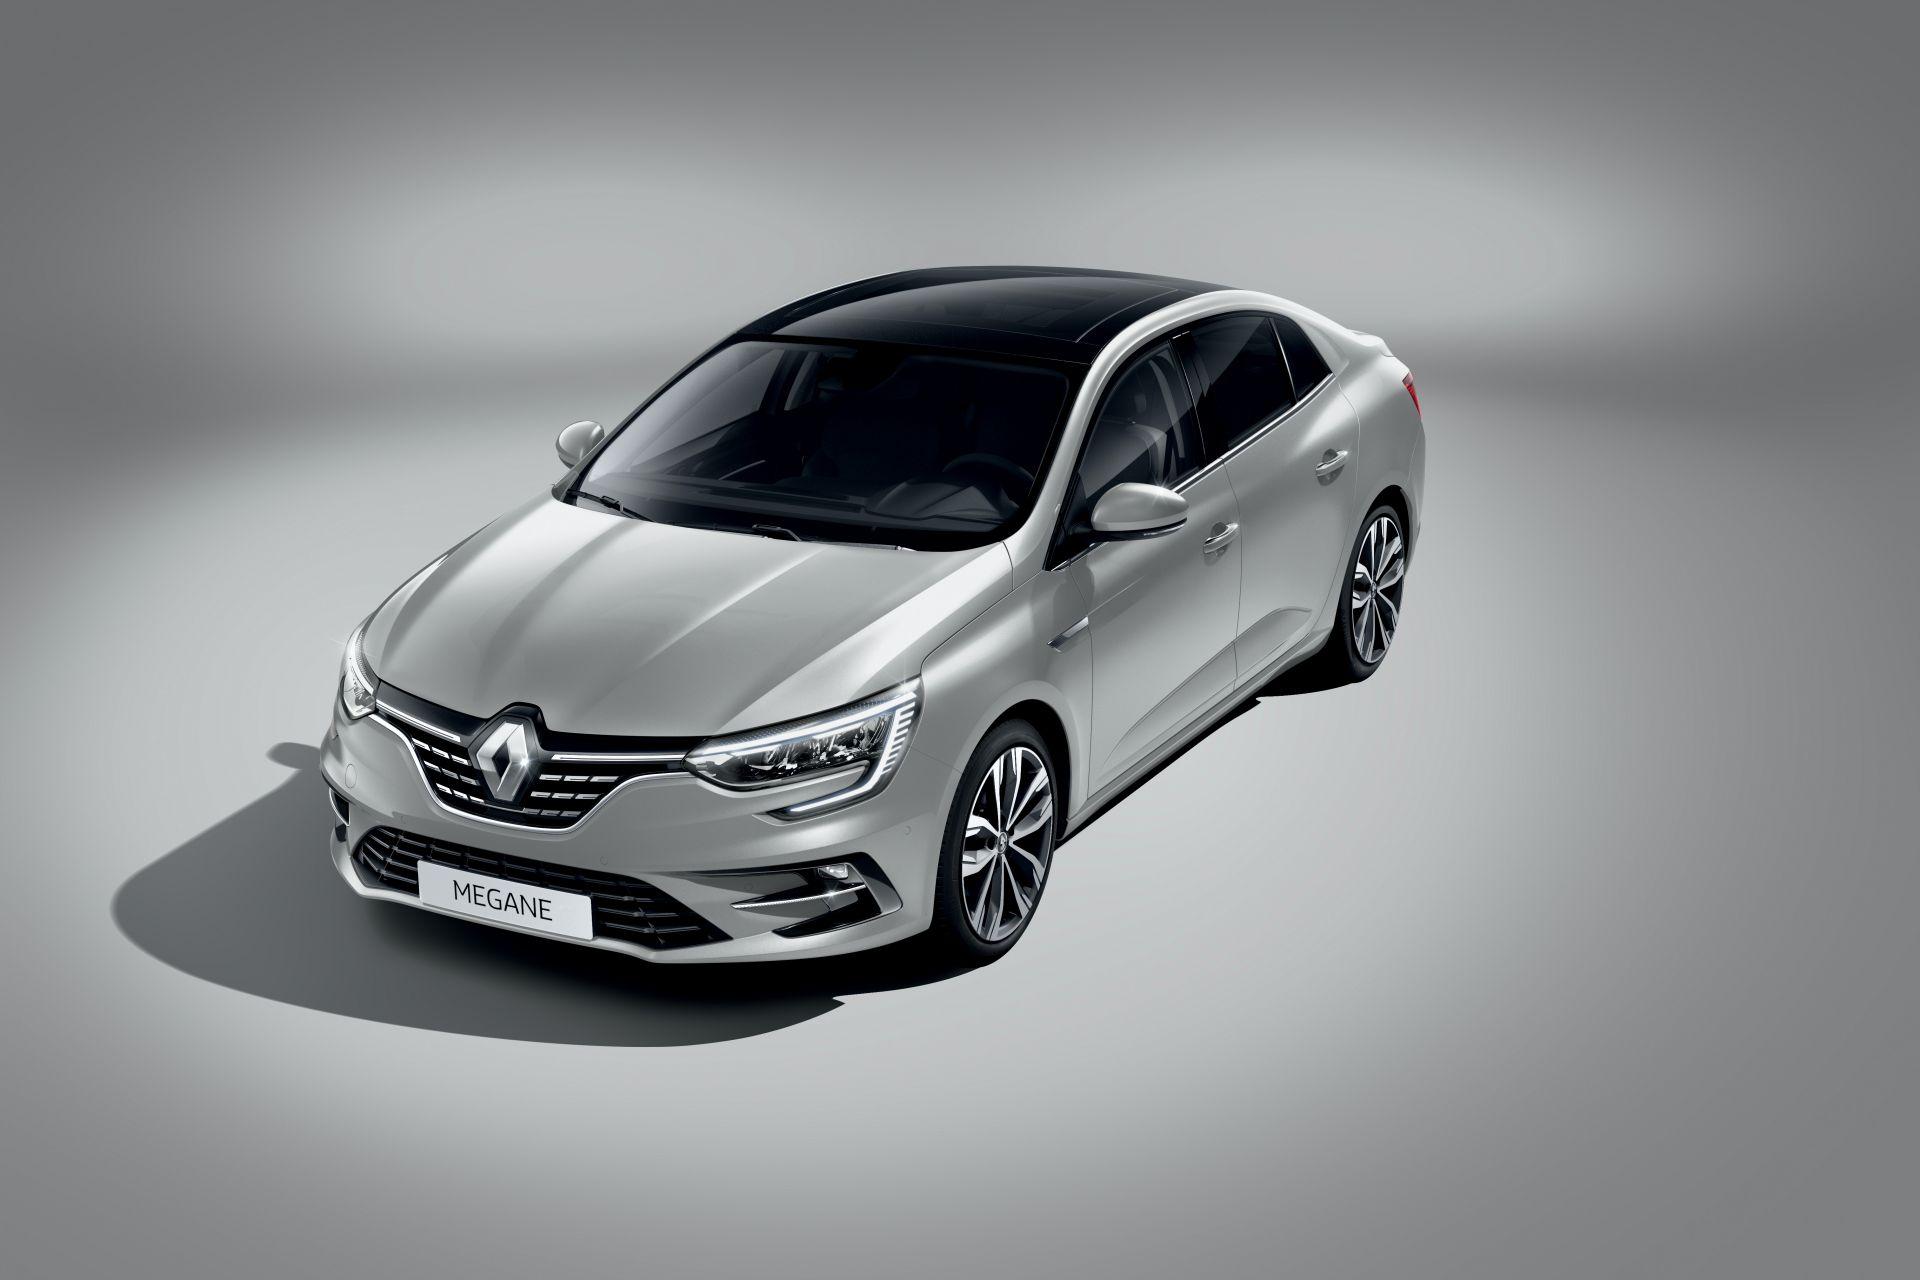 2021-Renault-Megane-Sedan-facelift-18